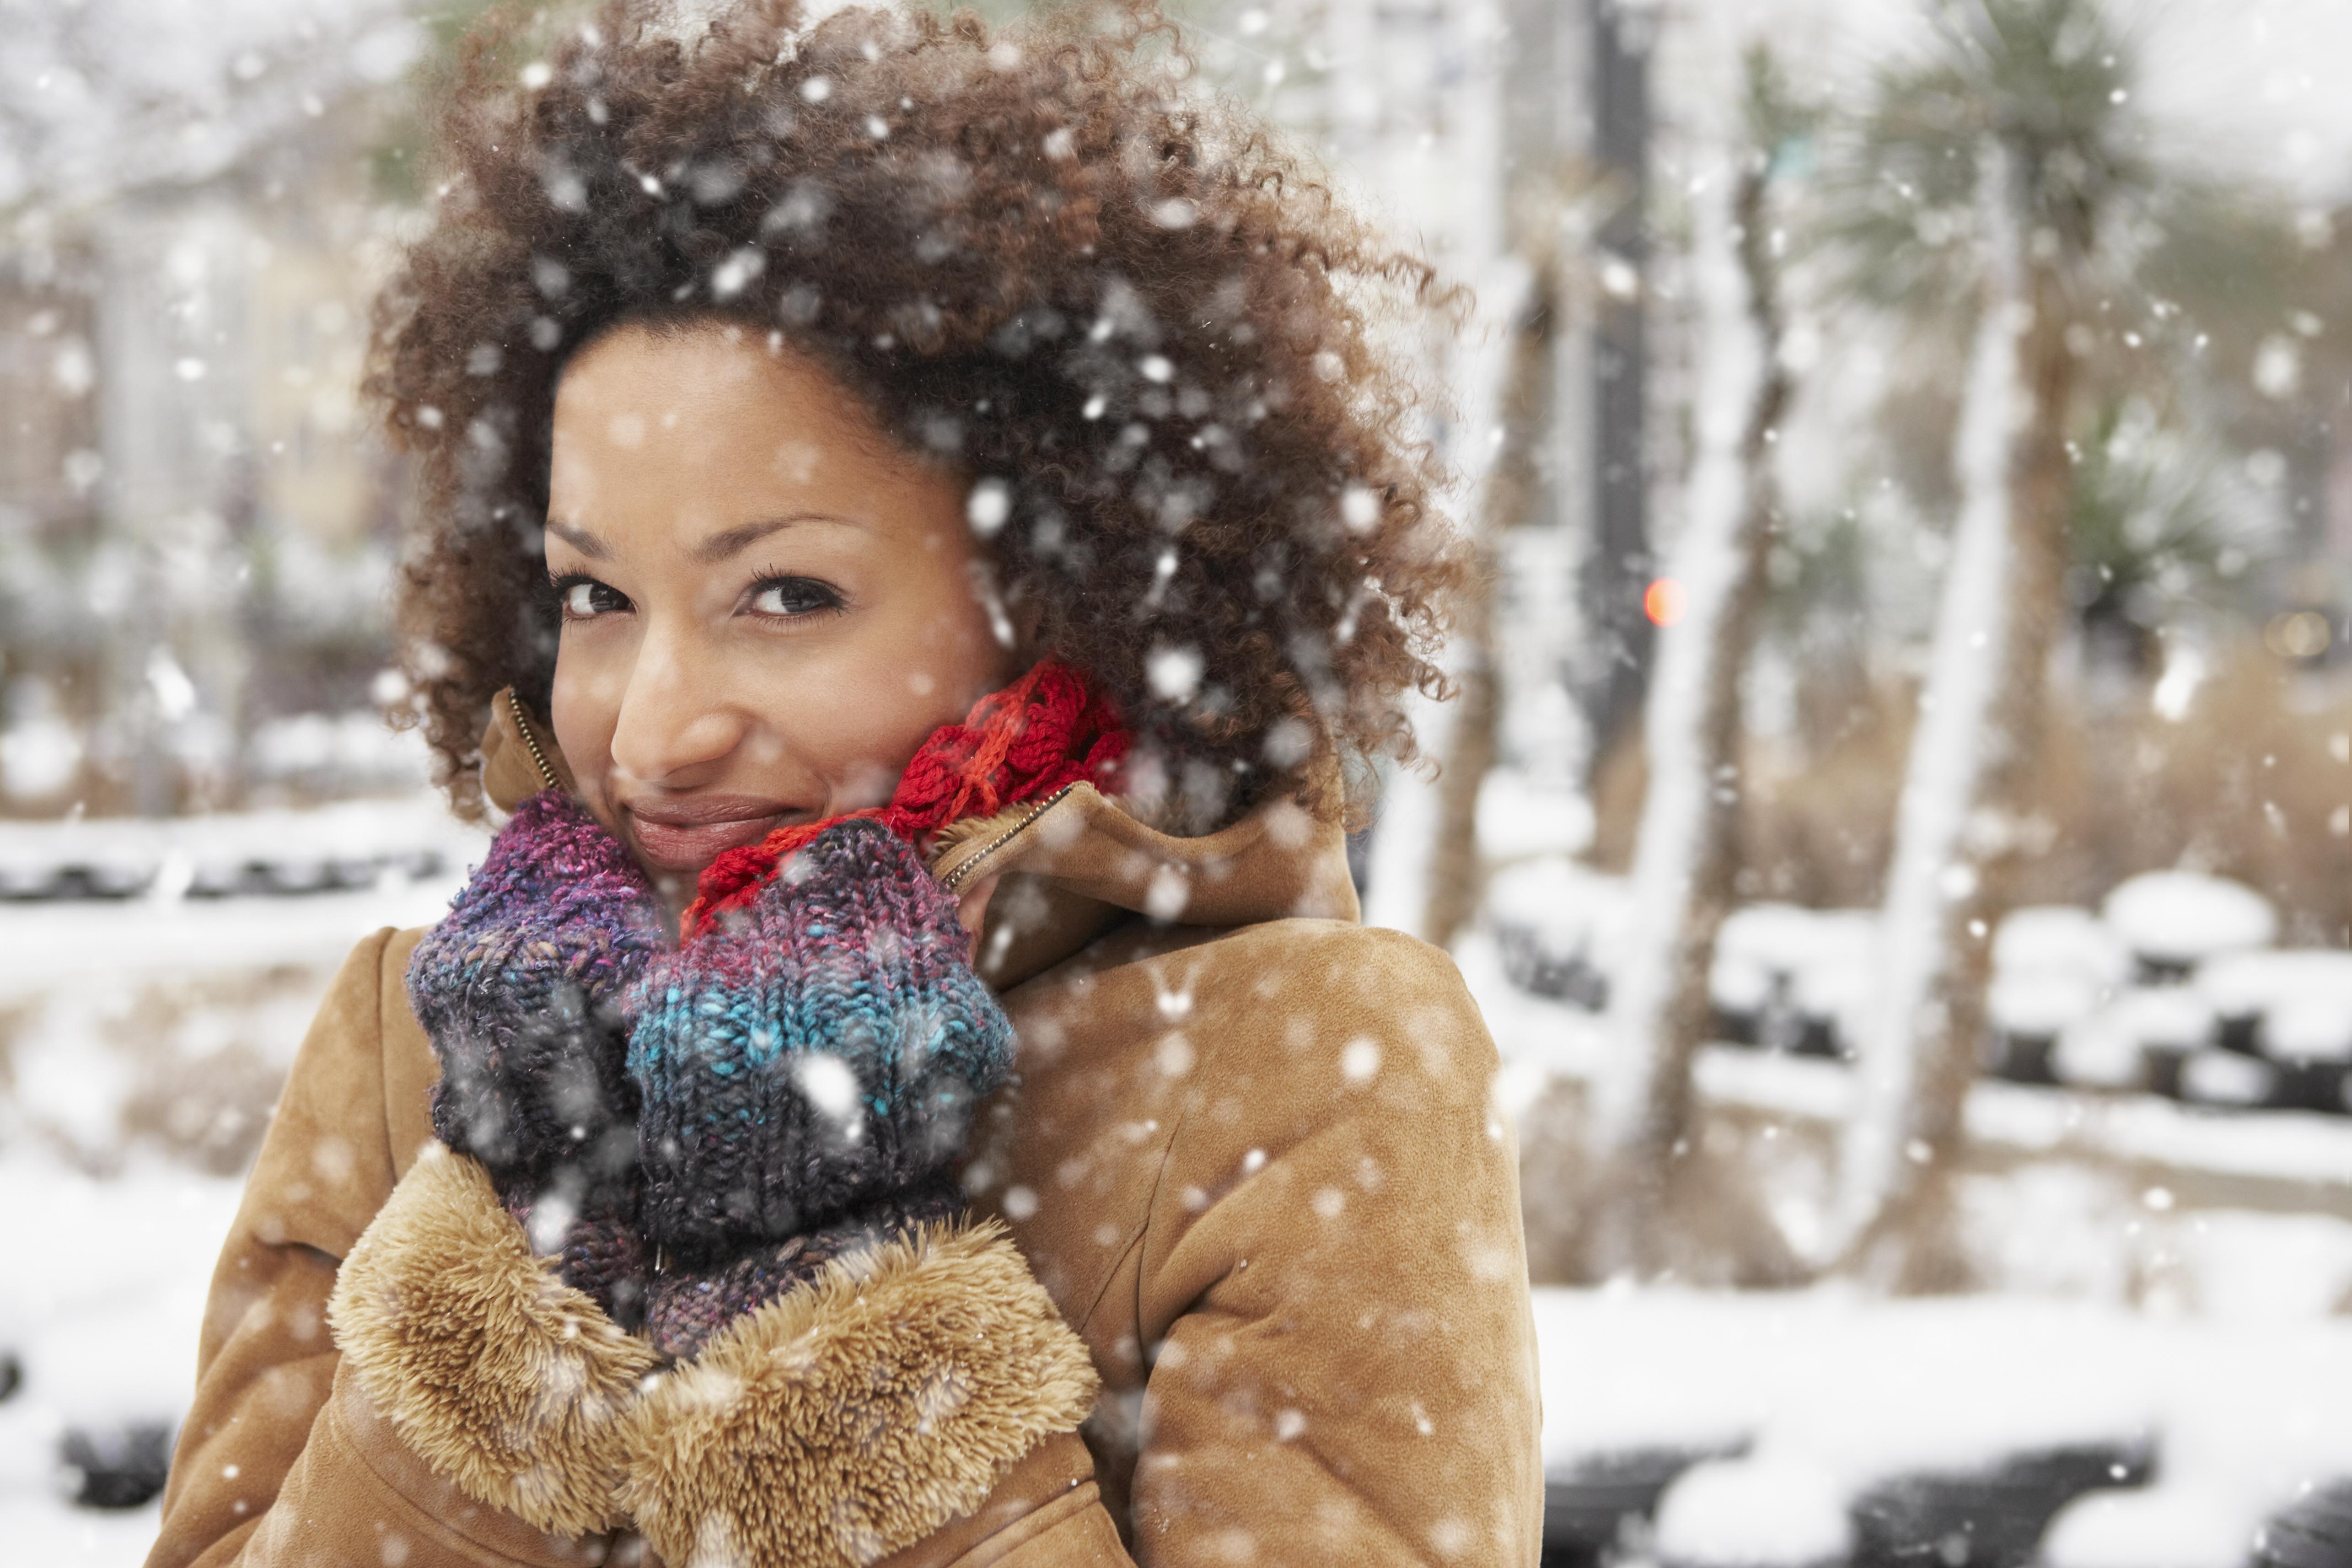 Young woman enjoying snowfall